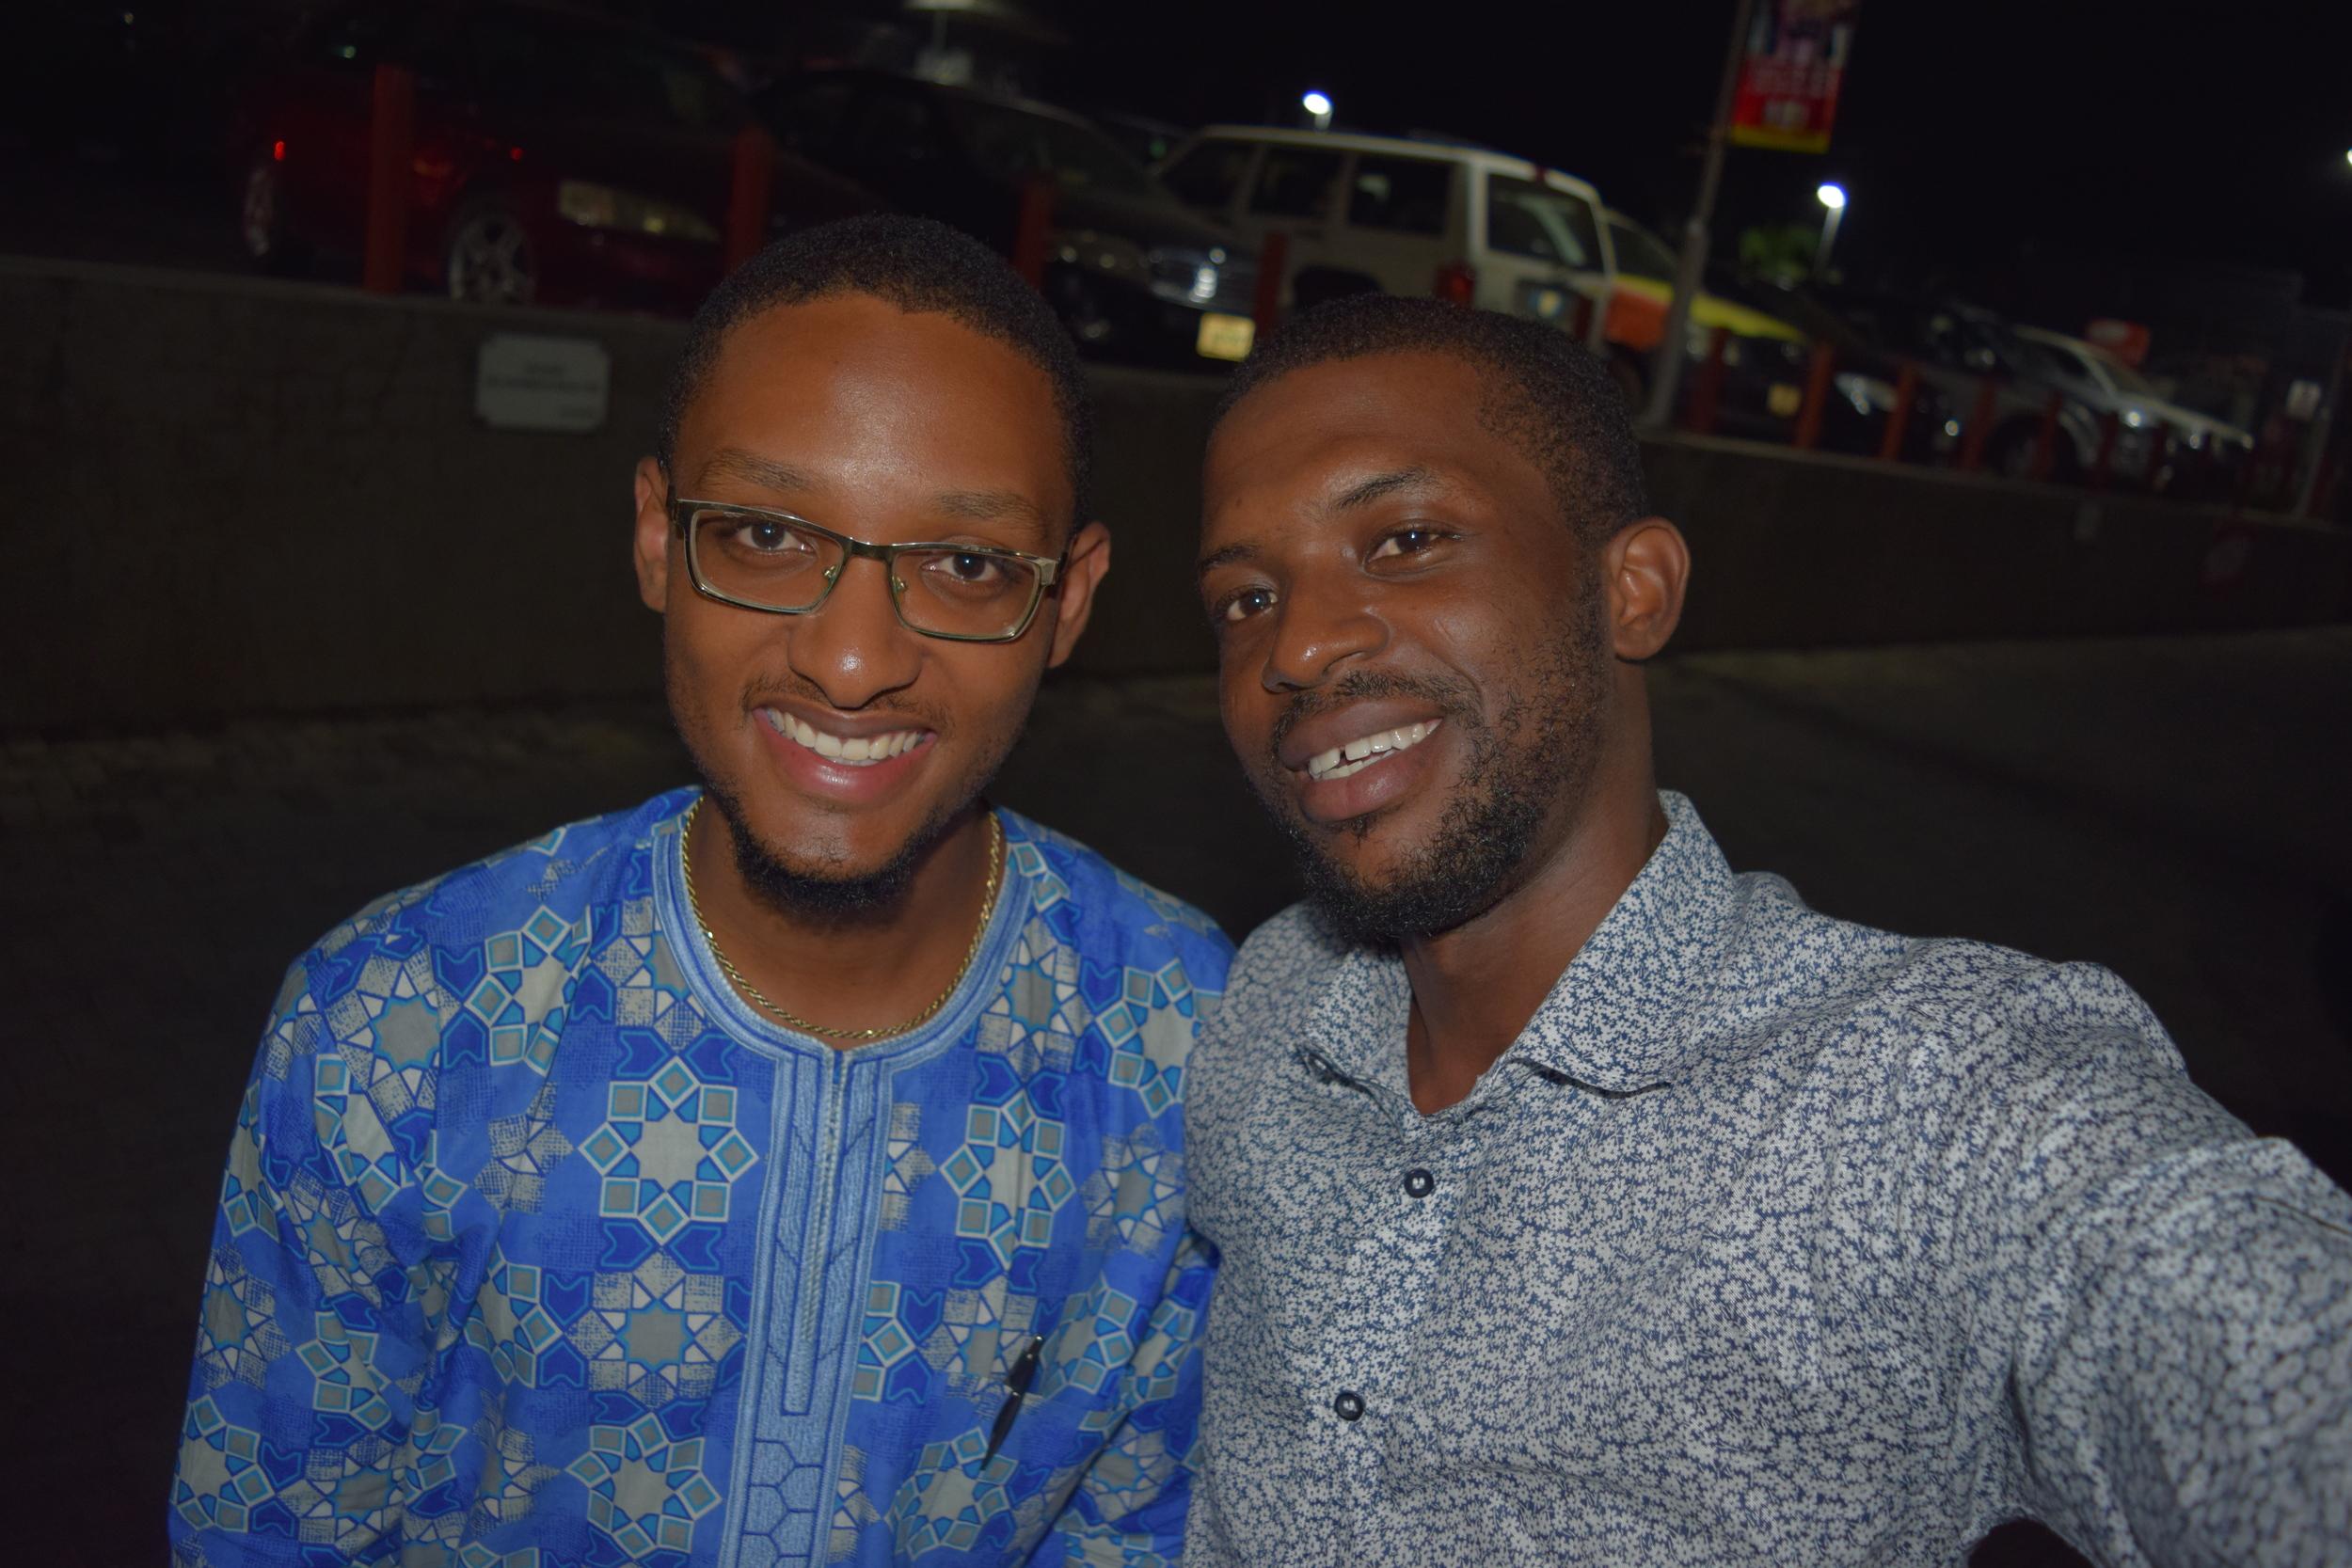 With Kayikunmi, smart guy